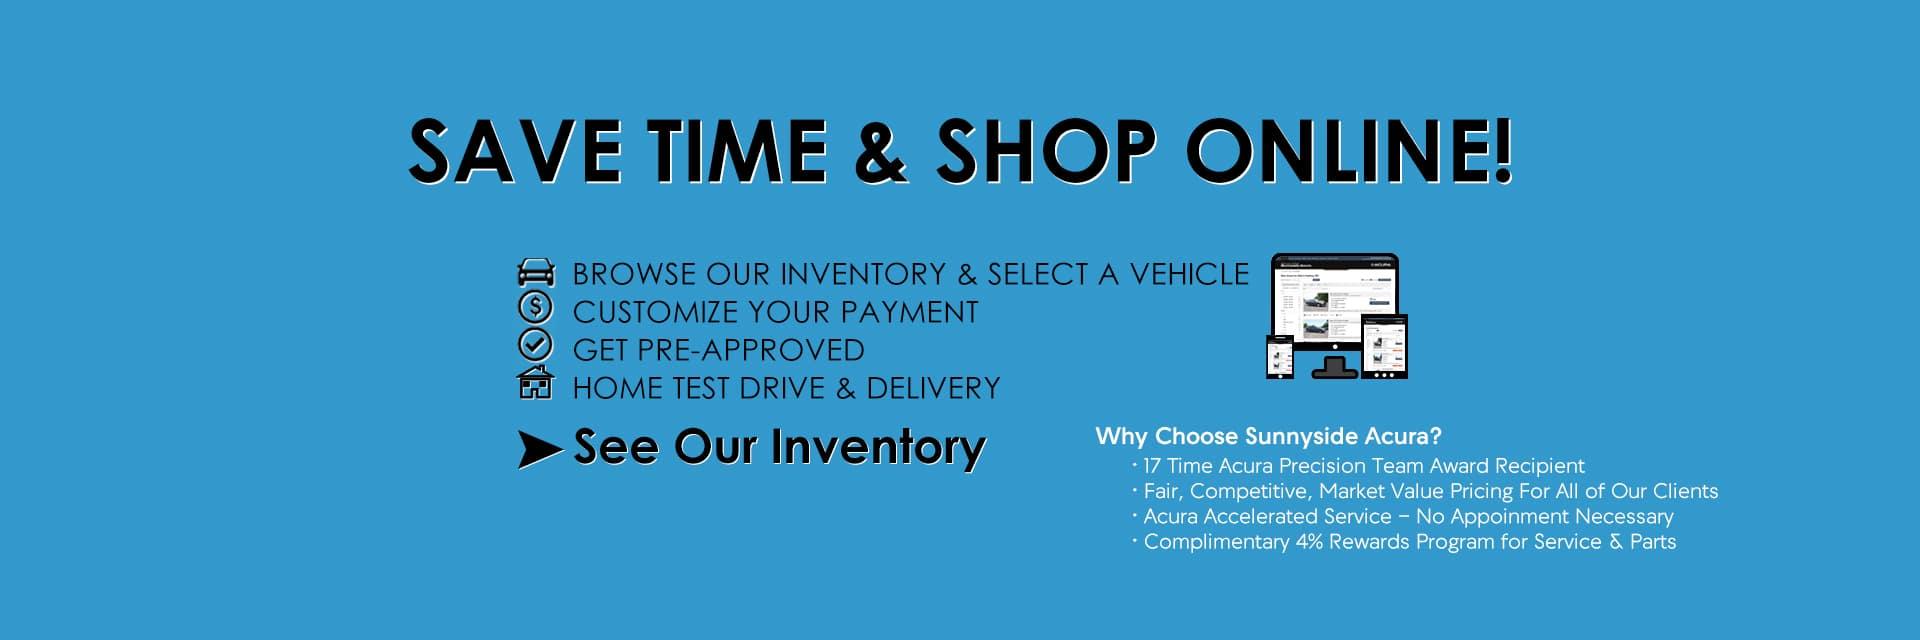 Shop Online at Sunnyside Acura Nashua, NH